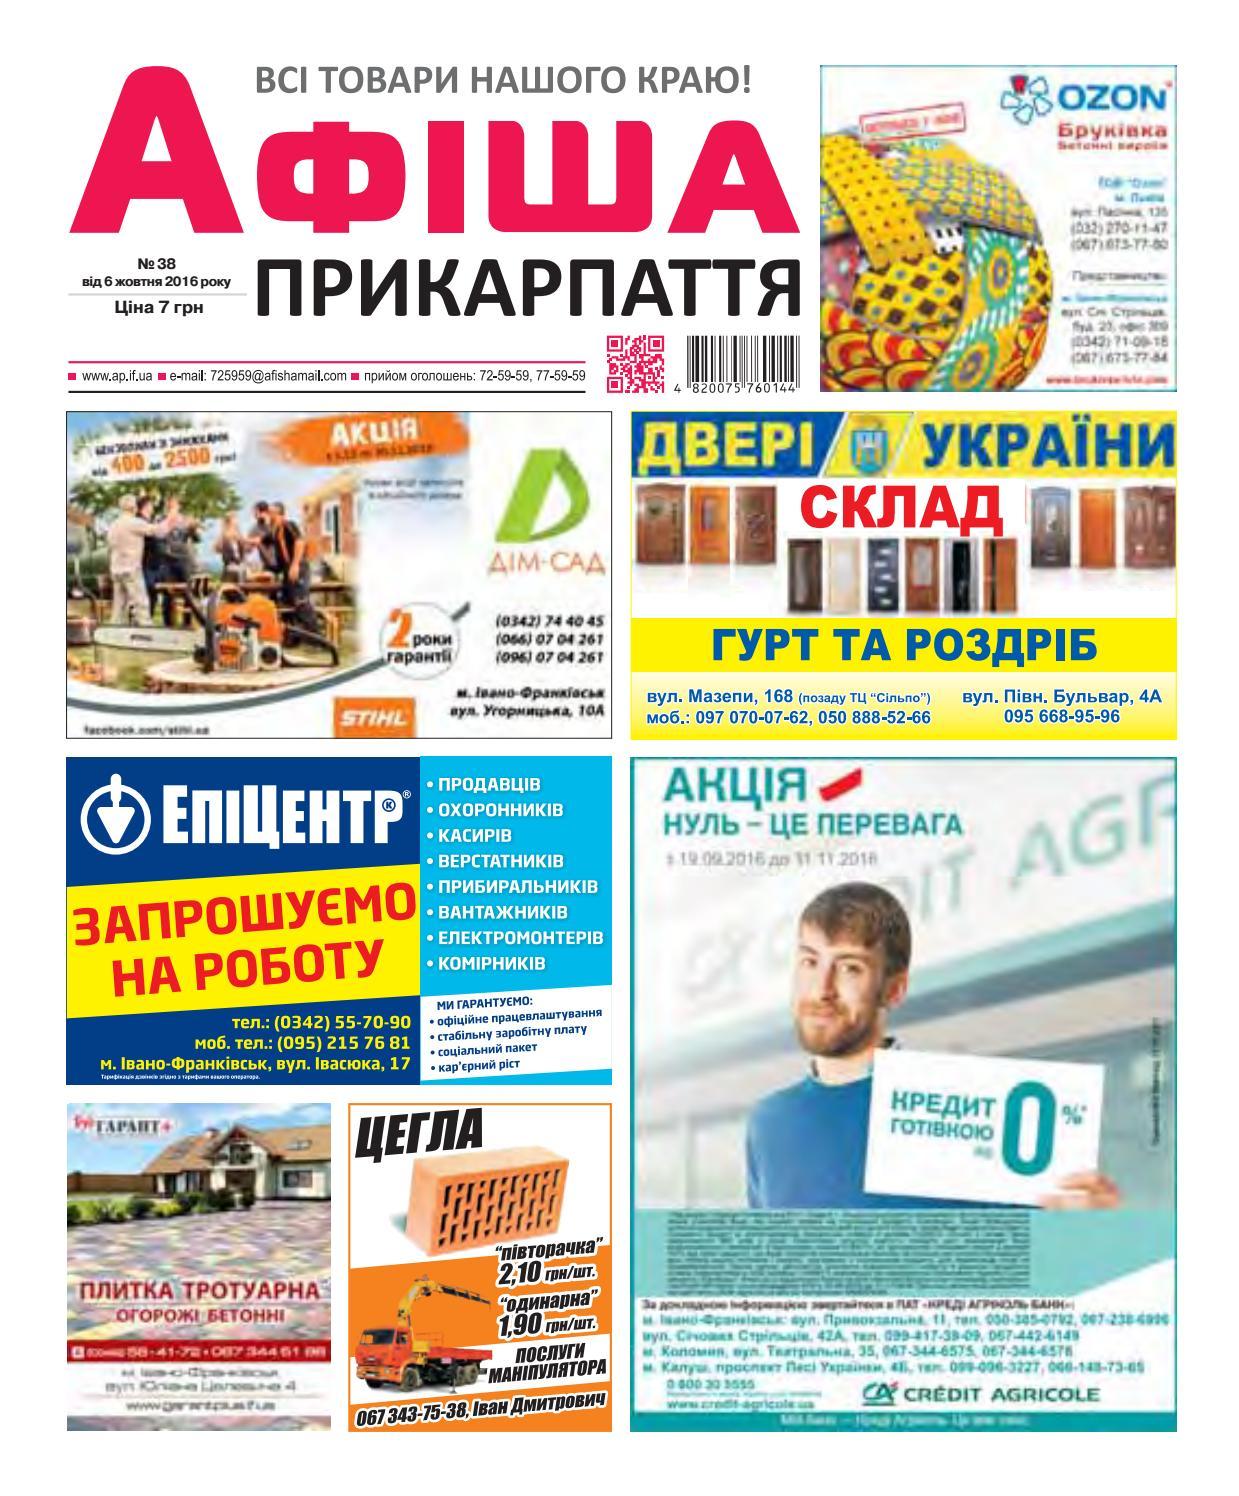 Афіша Прикарпаття №38 by Olya Olya - issuu 45ff6ad1addde